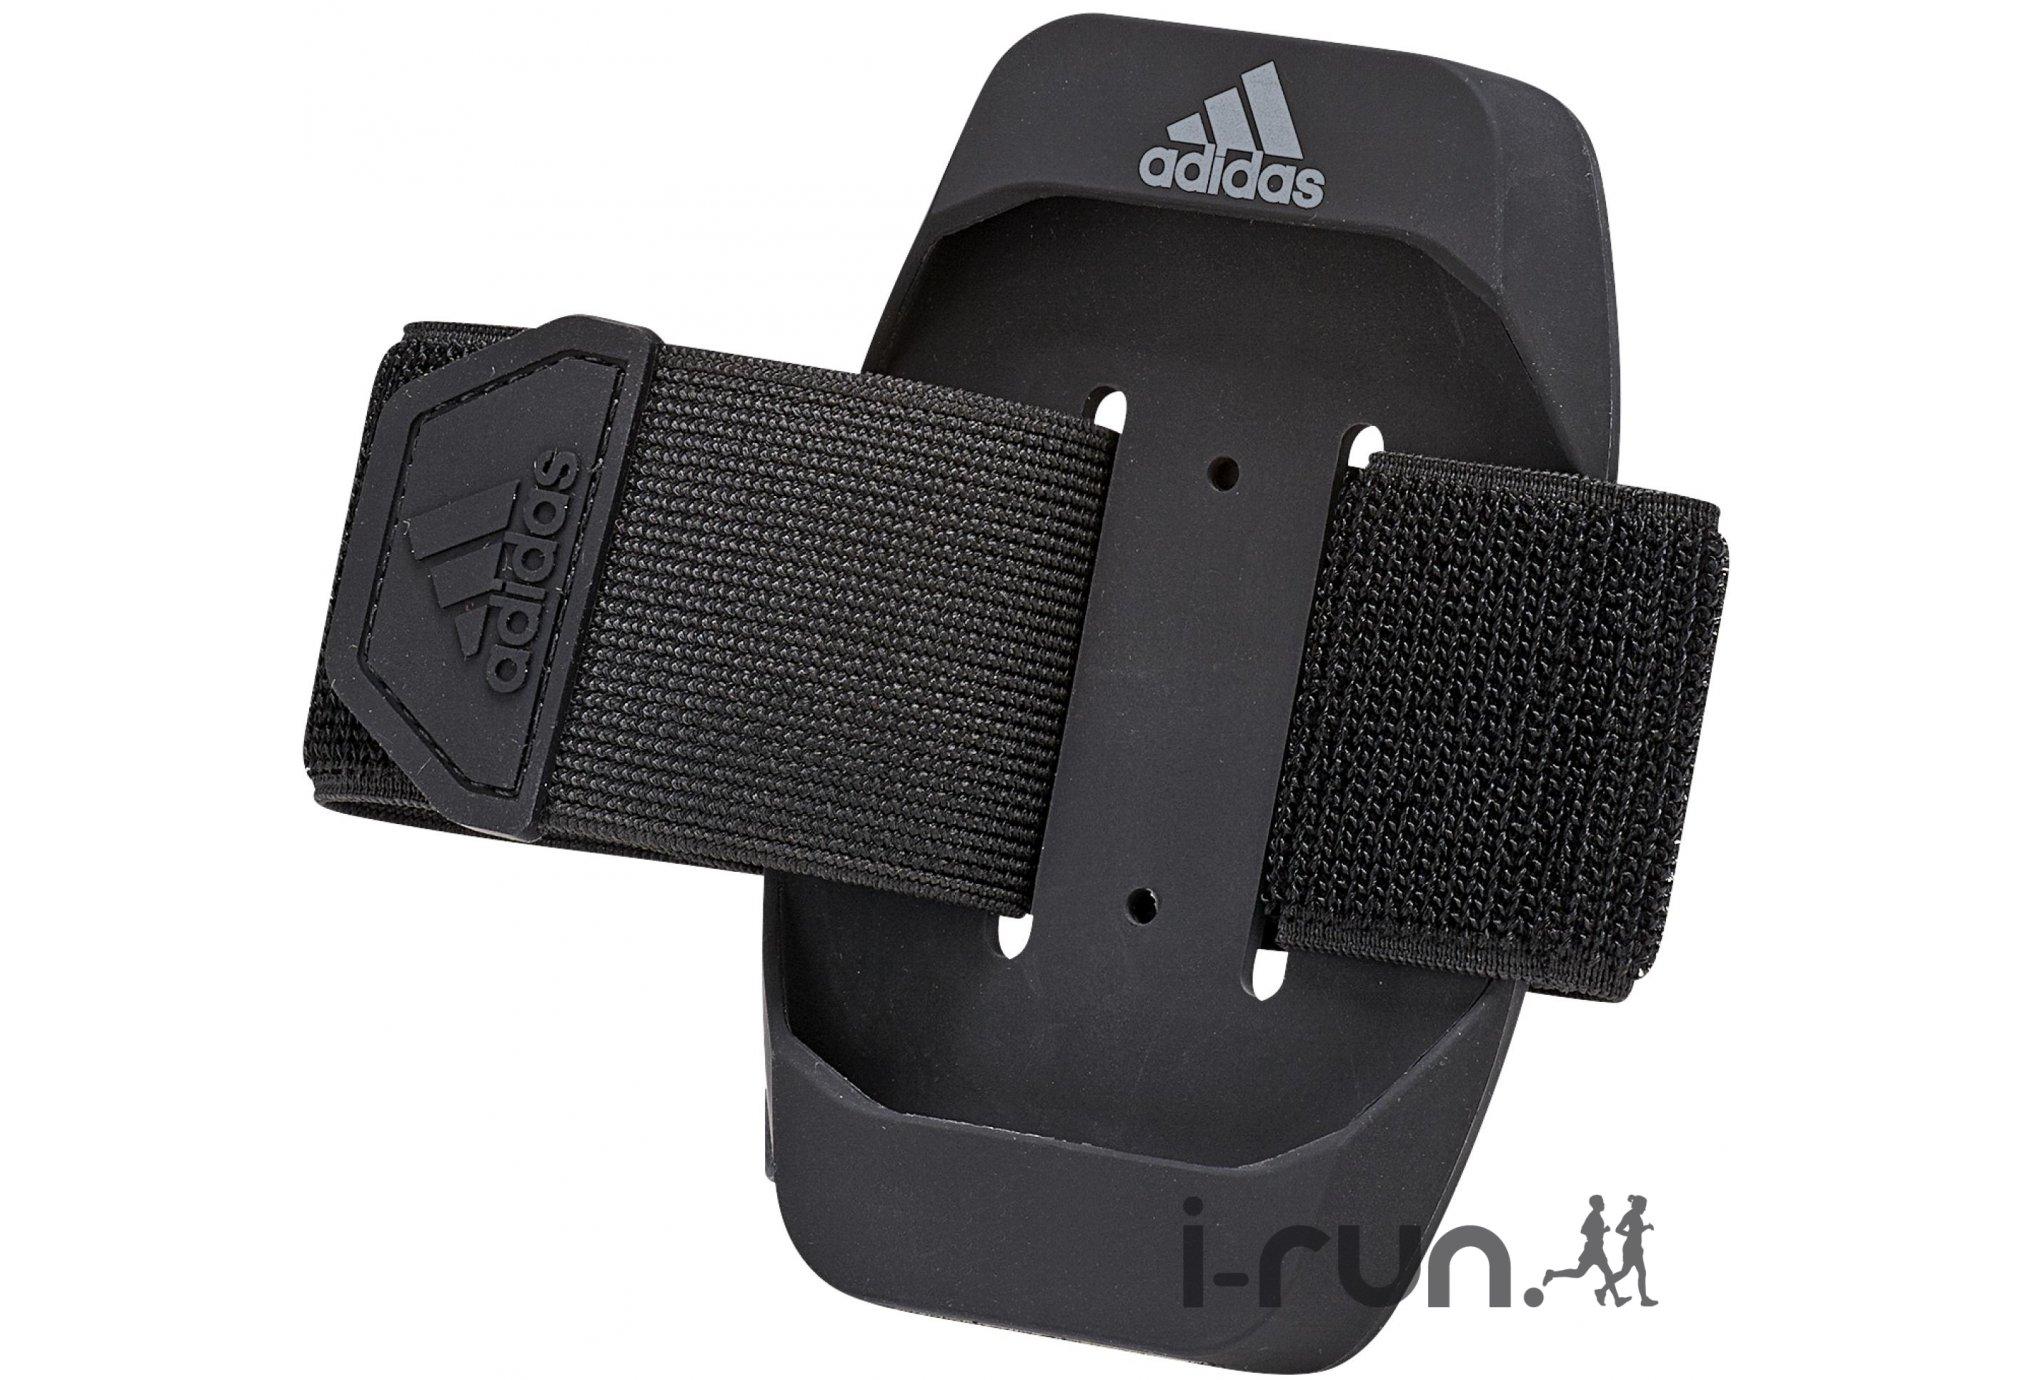 Adidas Brassard run media iphone 6 accessoires téléphone